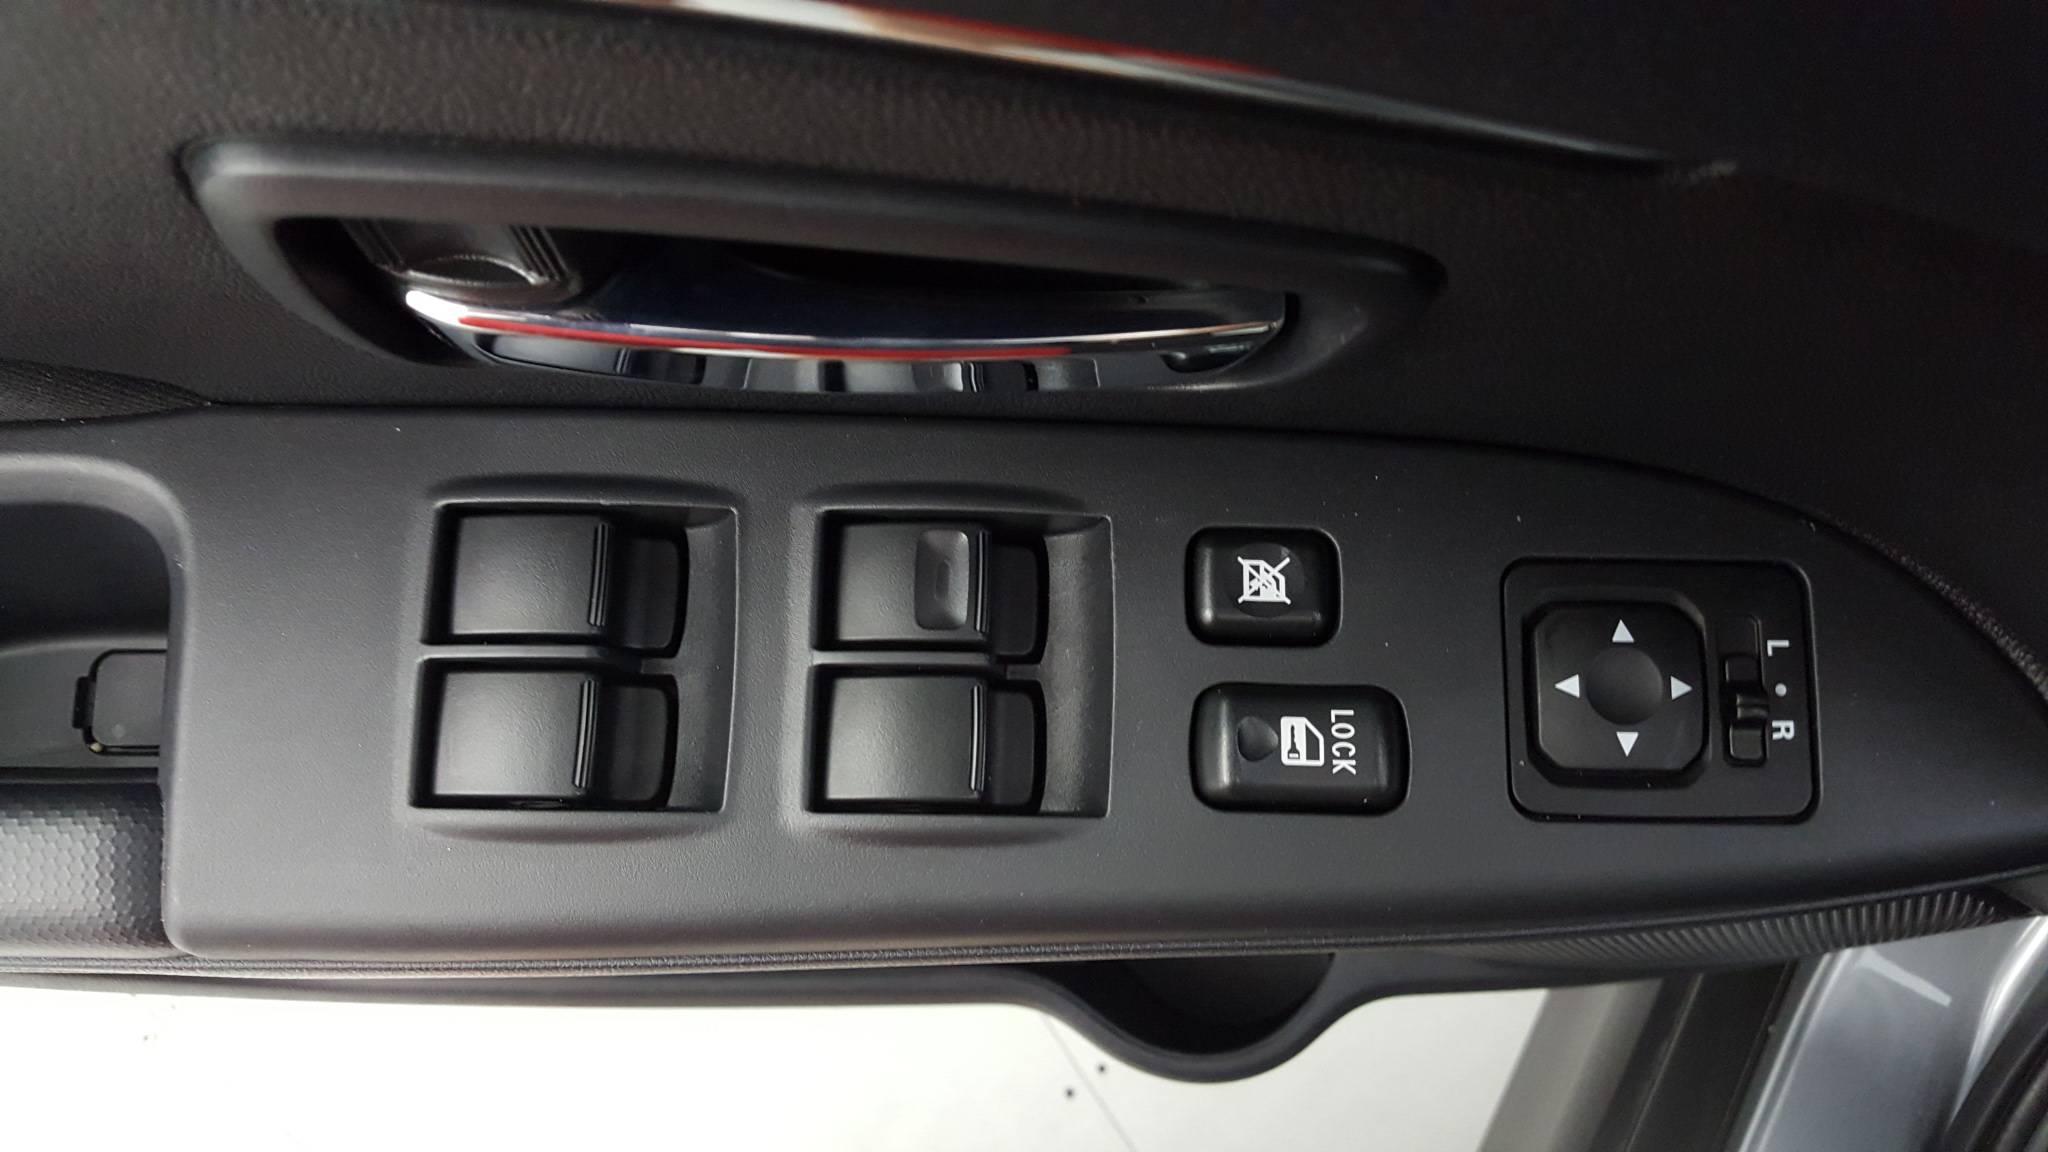 Pre-Owned 2019 Mitsubishi Outlander Sport LE 2.0